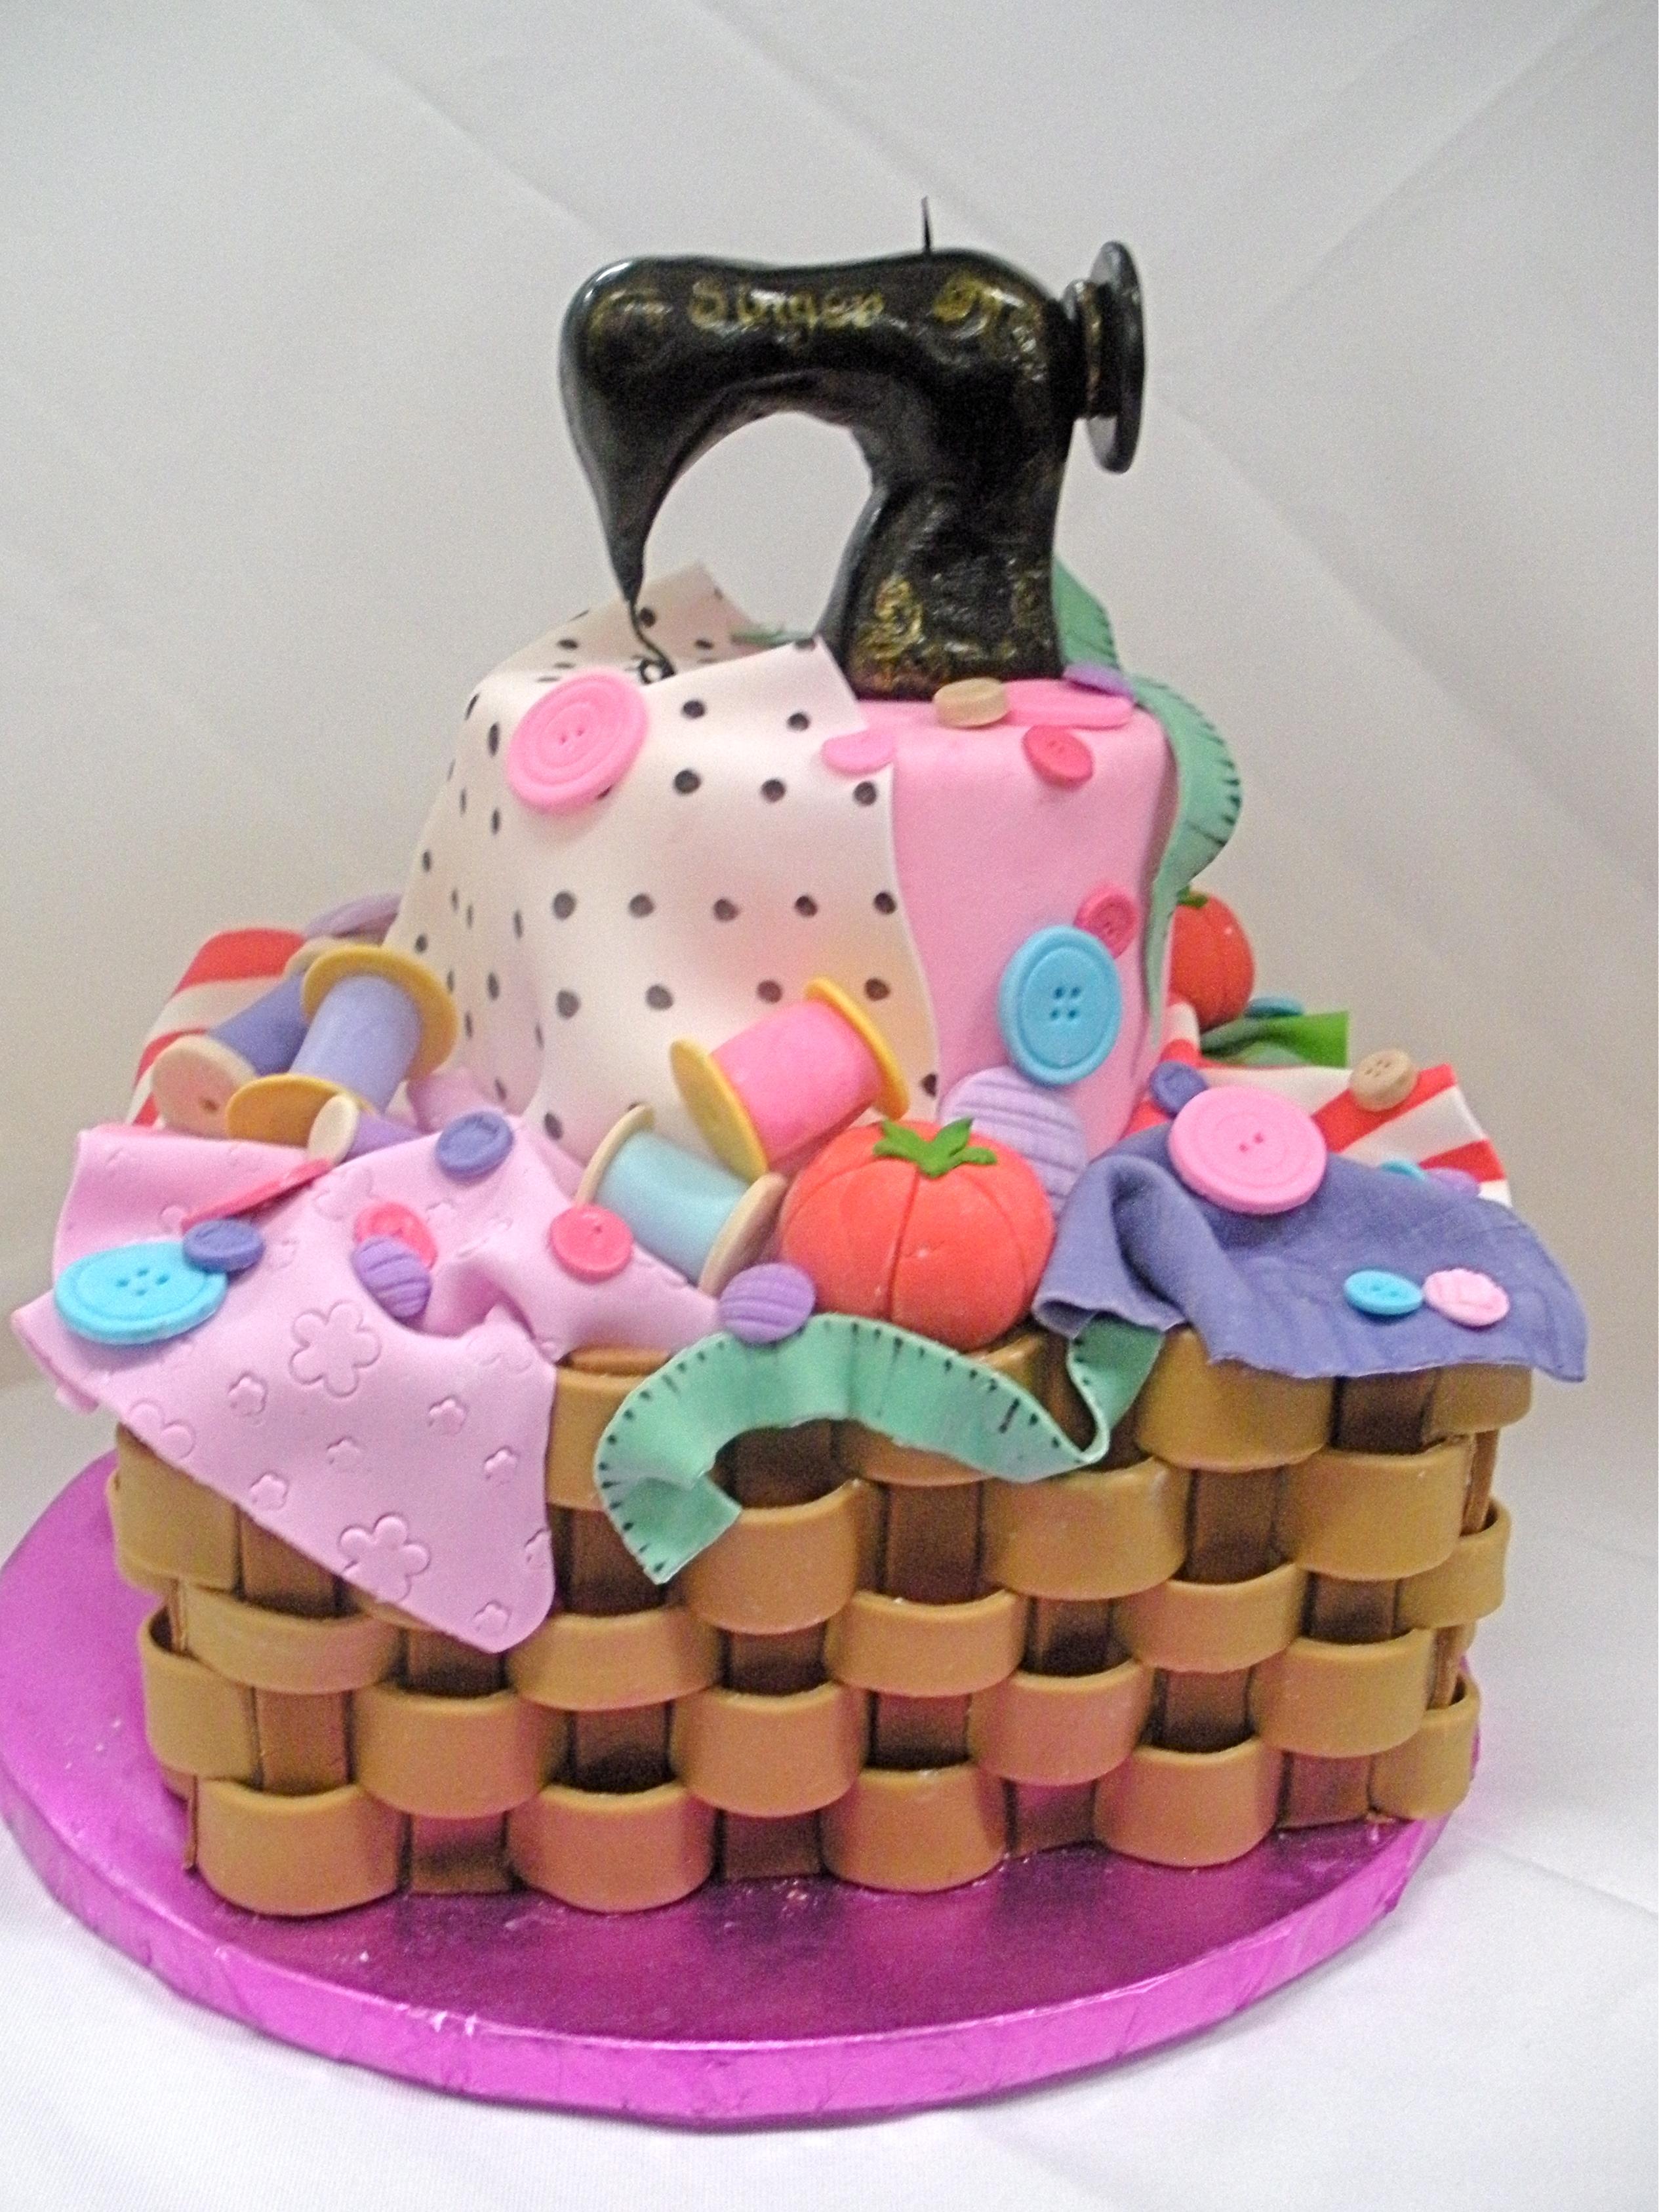 Christmas Cake, Black Cake, Fruit Cake, Voodoo Cake Call it what you ...